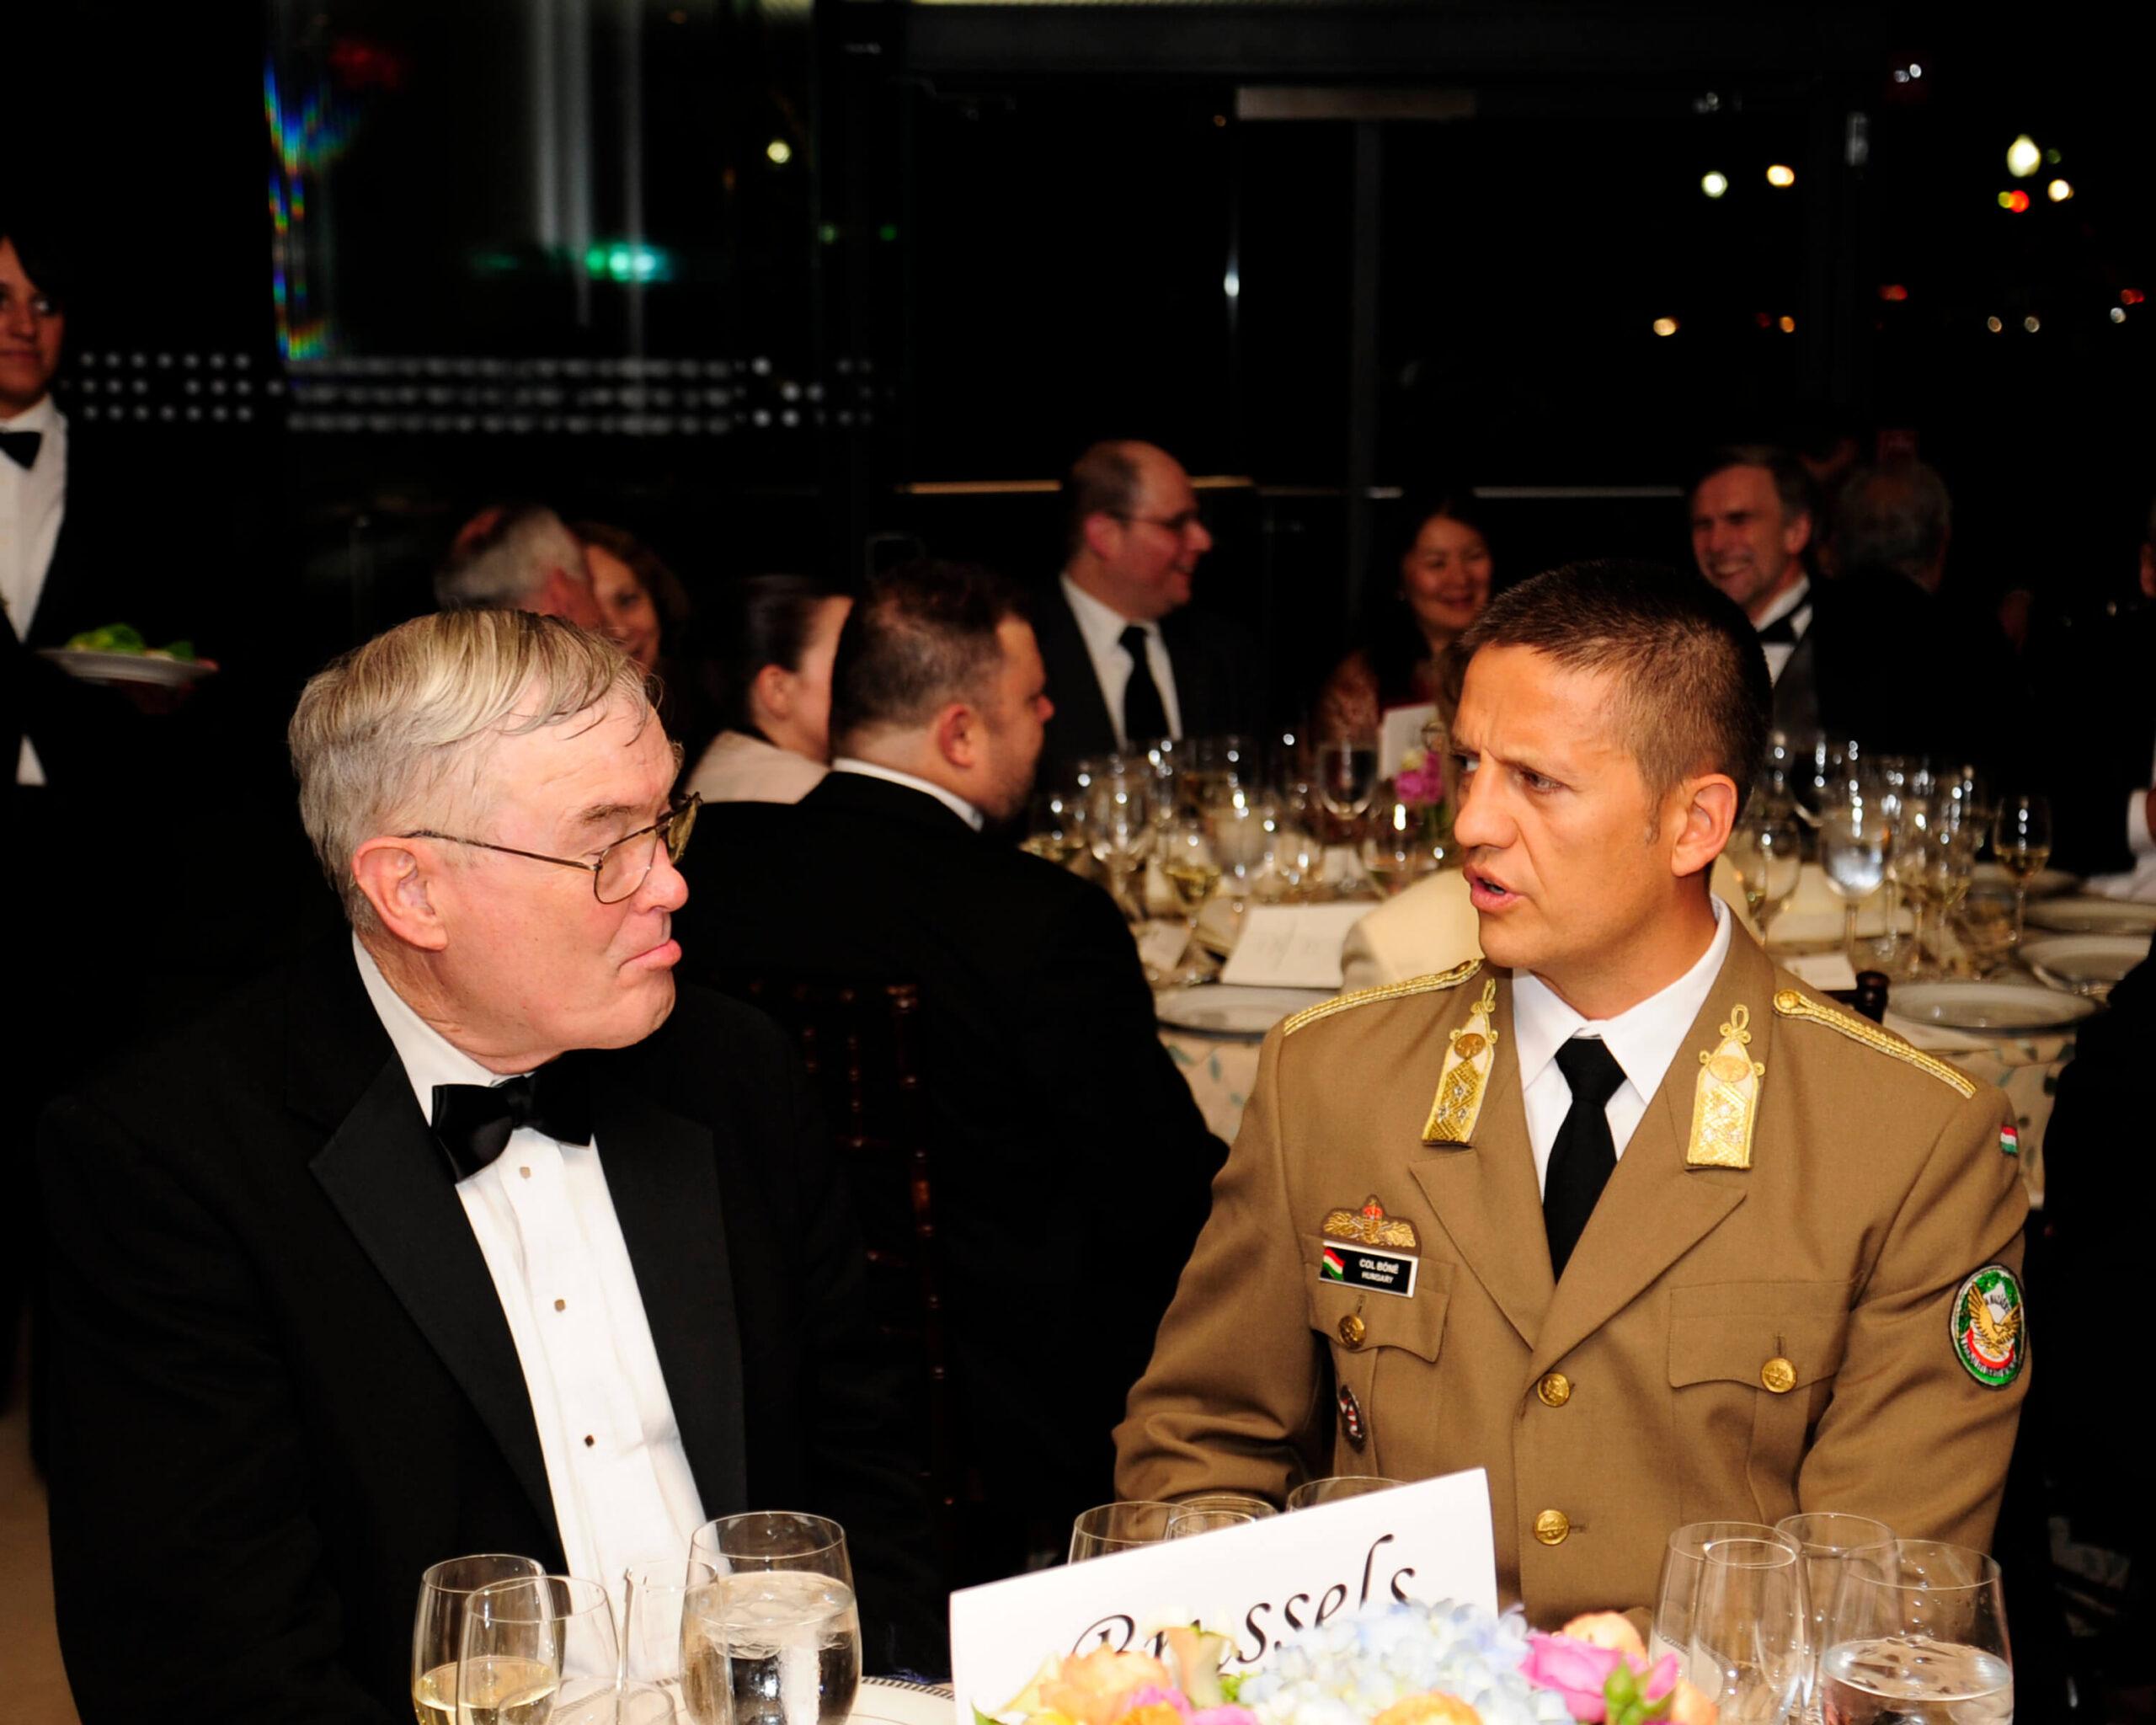 Lt. General Nicholas Kehoe (Ret.) and Col. Zoltan Bone